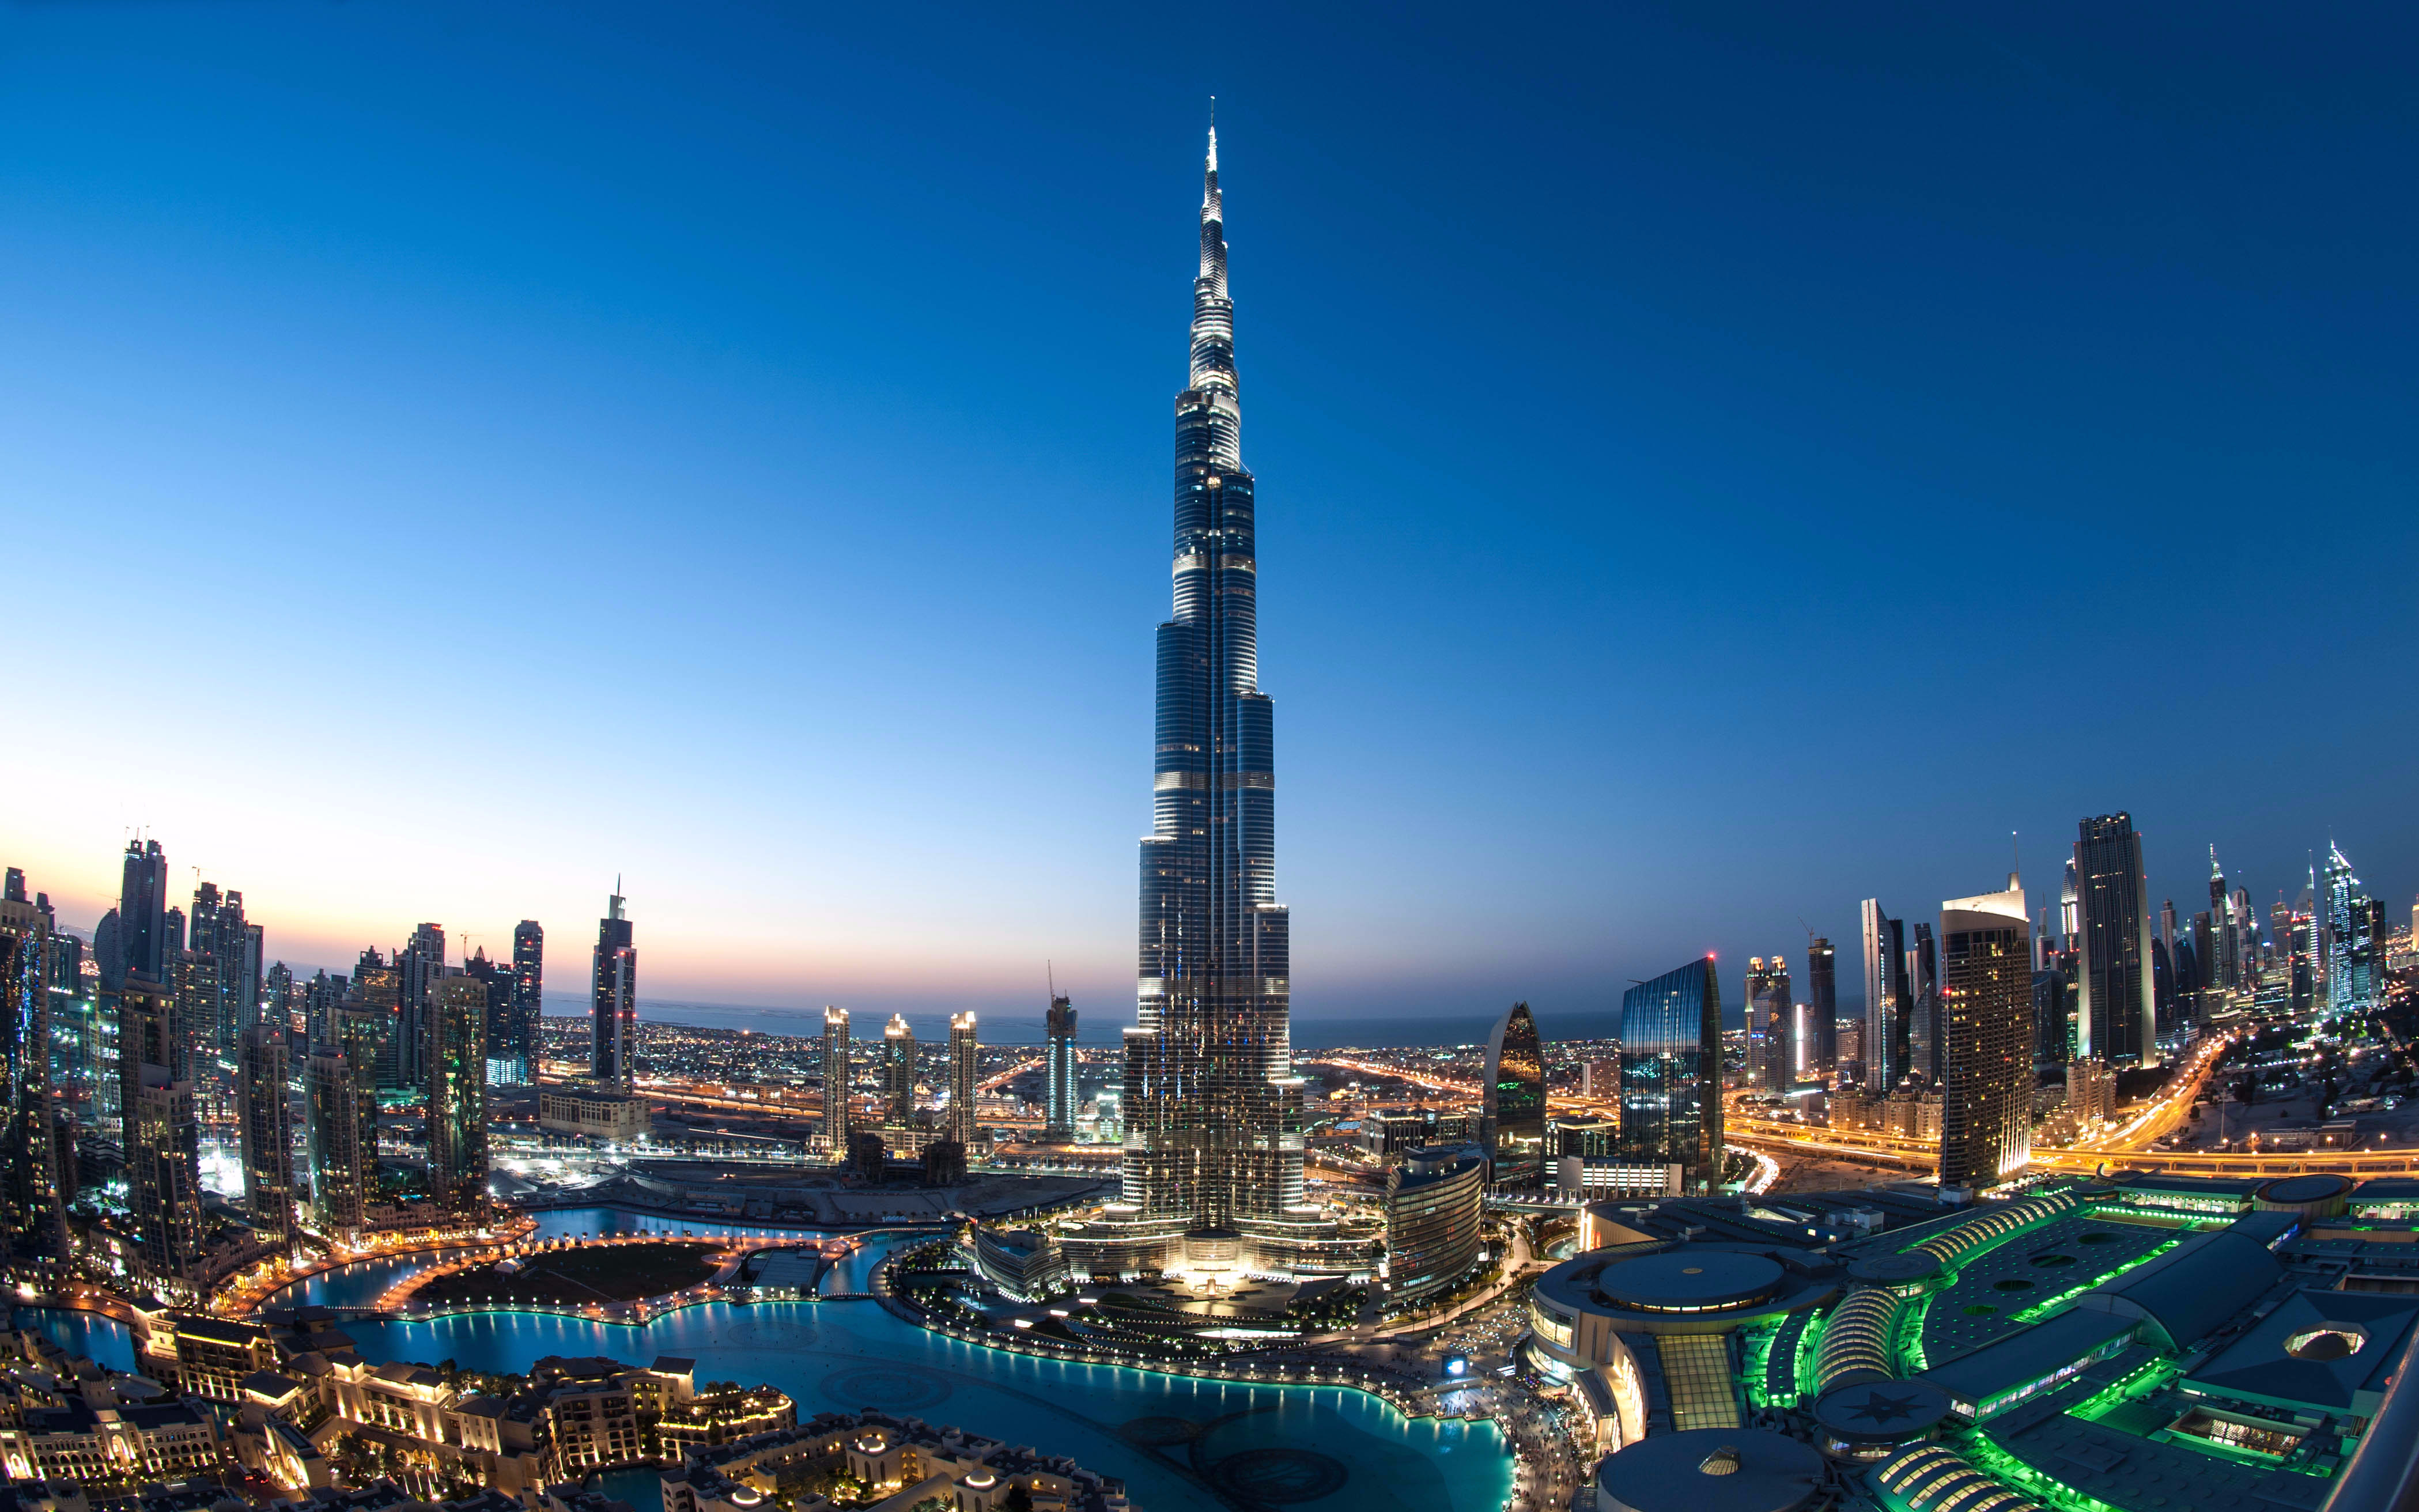 2 Day Combo: Burj Khalifa + Desert Safari + Dubai City Tour